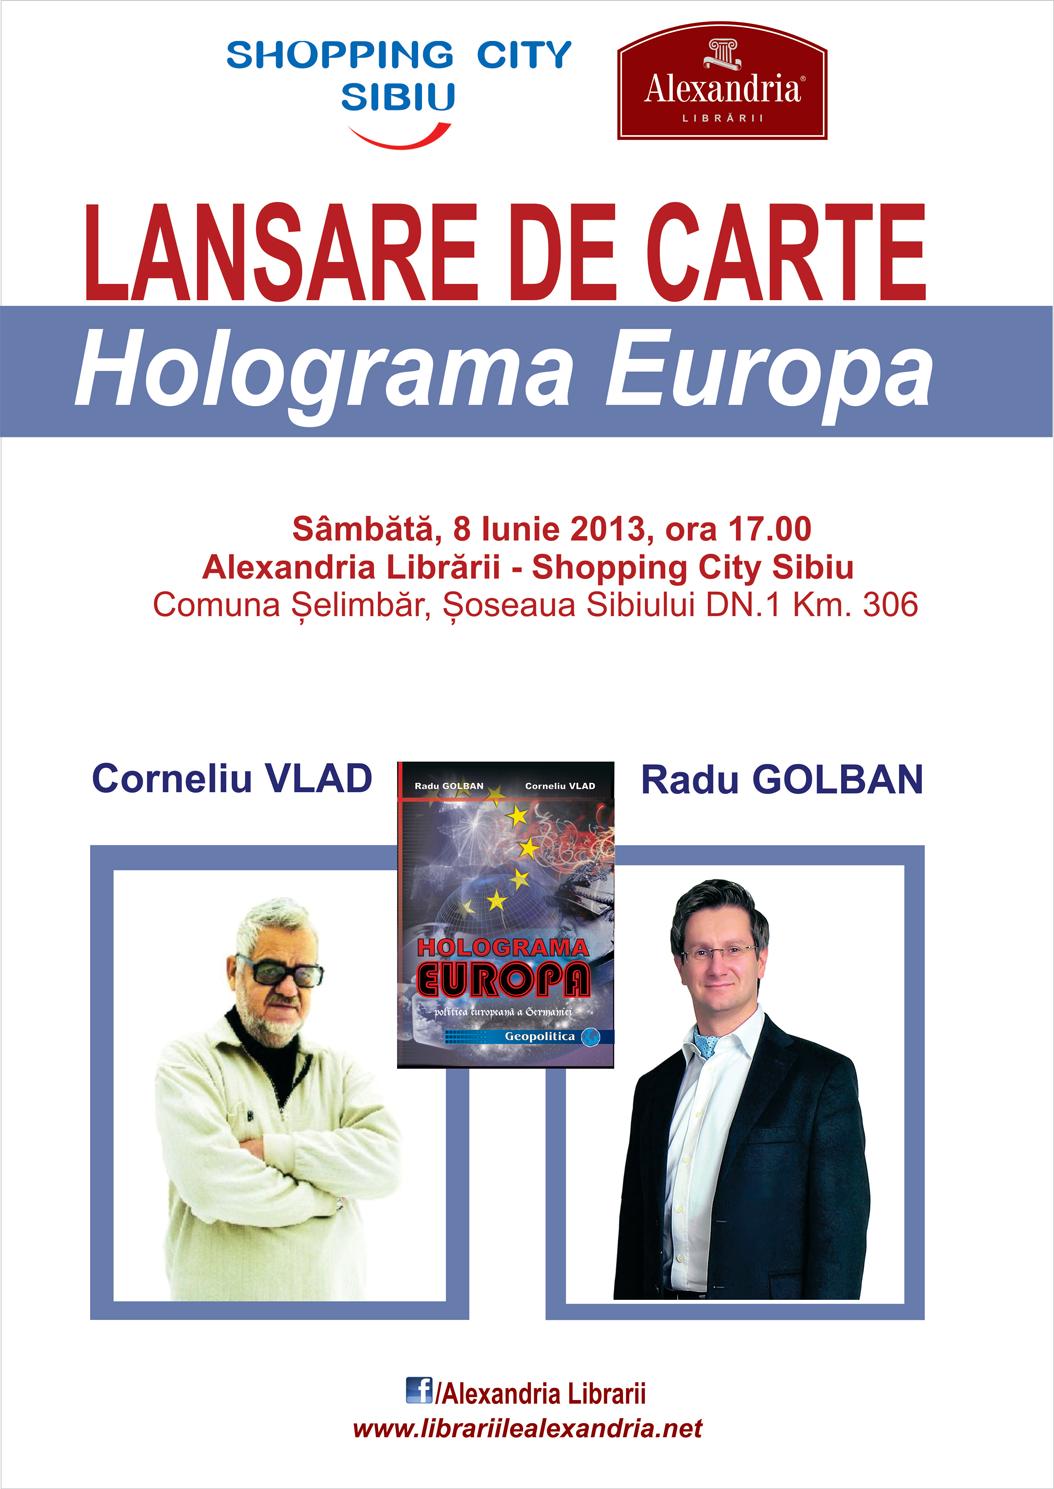 Lansare-Radu-Golban-SIBIU